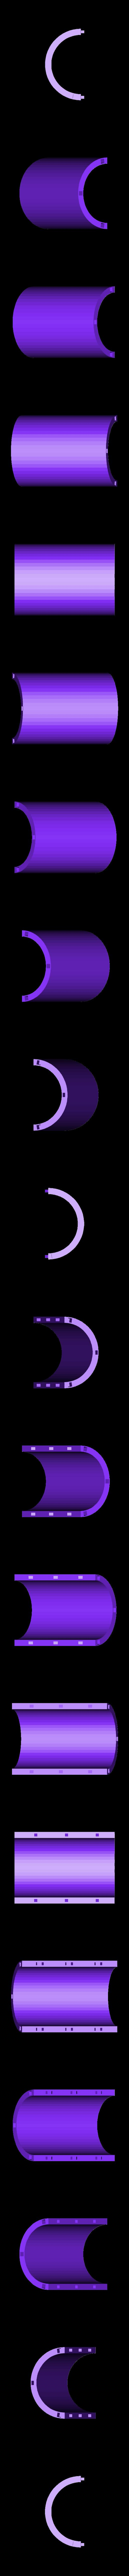 Case_Top.stl Download free STL file Archimedes Screw Bonanza • 3D printer design, Urulysman